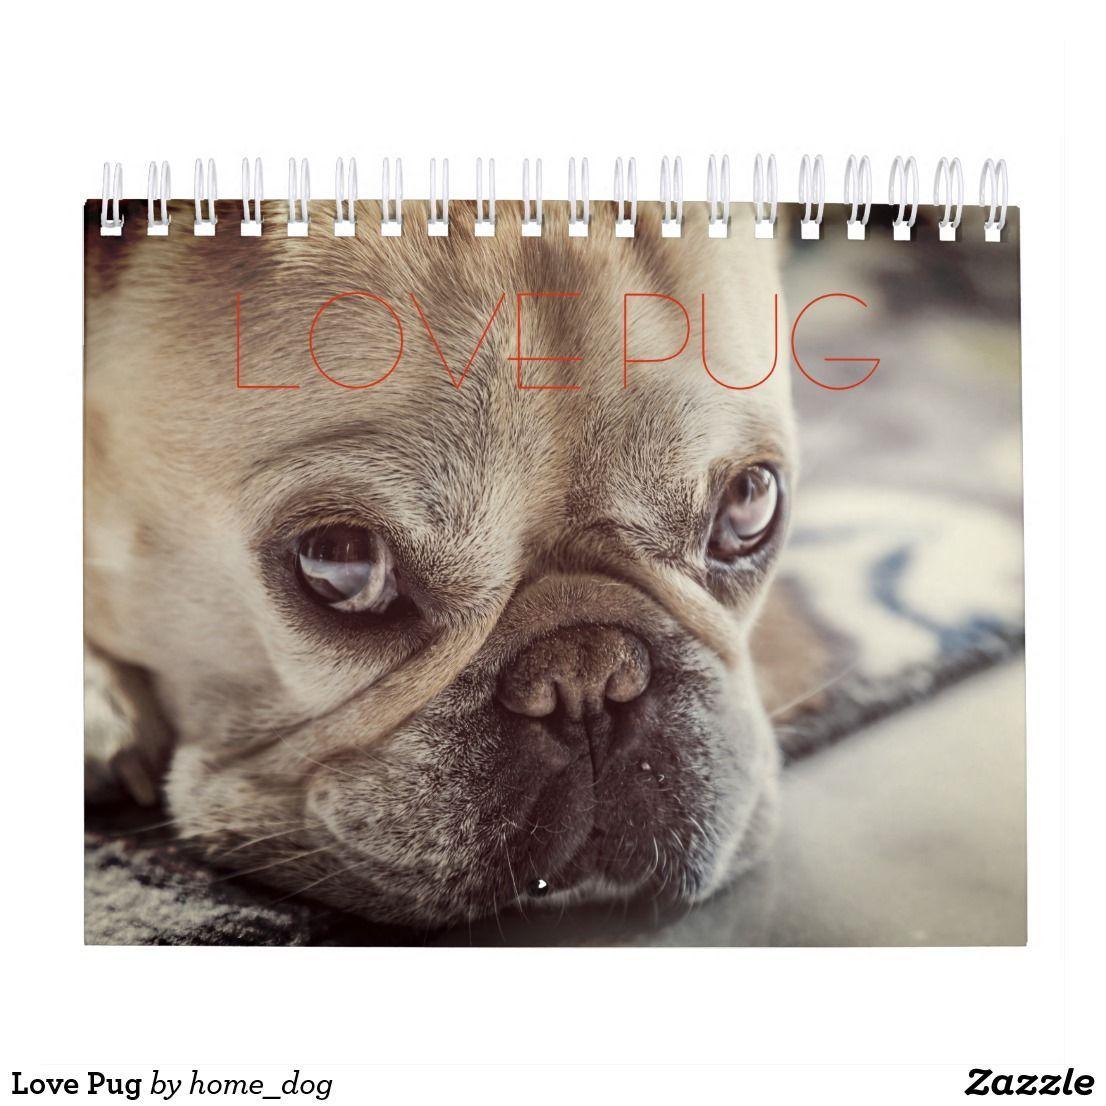 Love Pug Calendar Pug Pug Puppies Cutest Pug Funny Pug